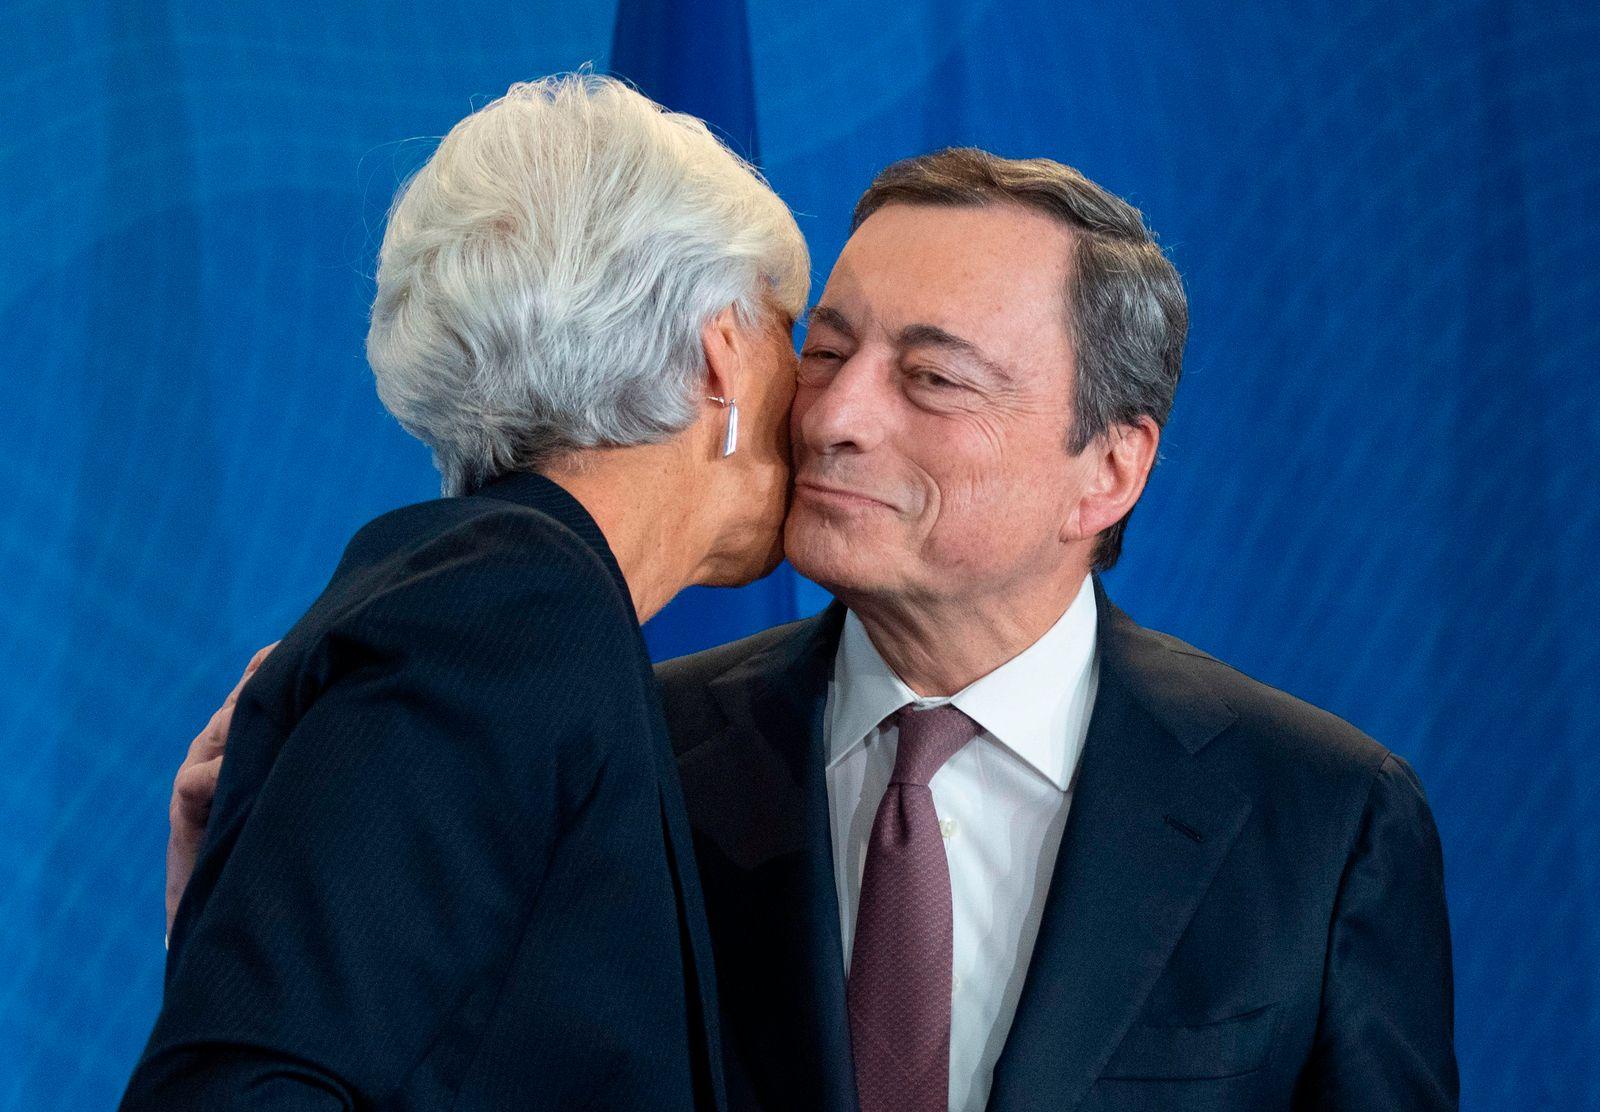 Mario Draghi / Lagarde